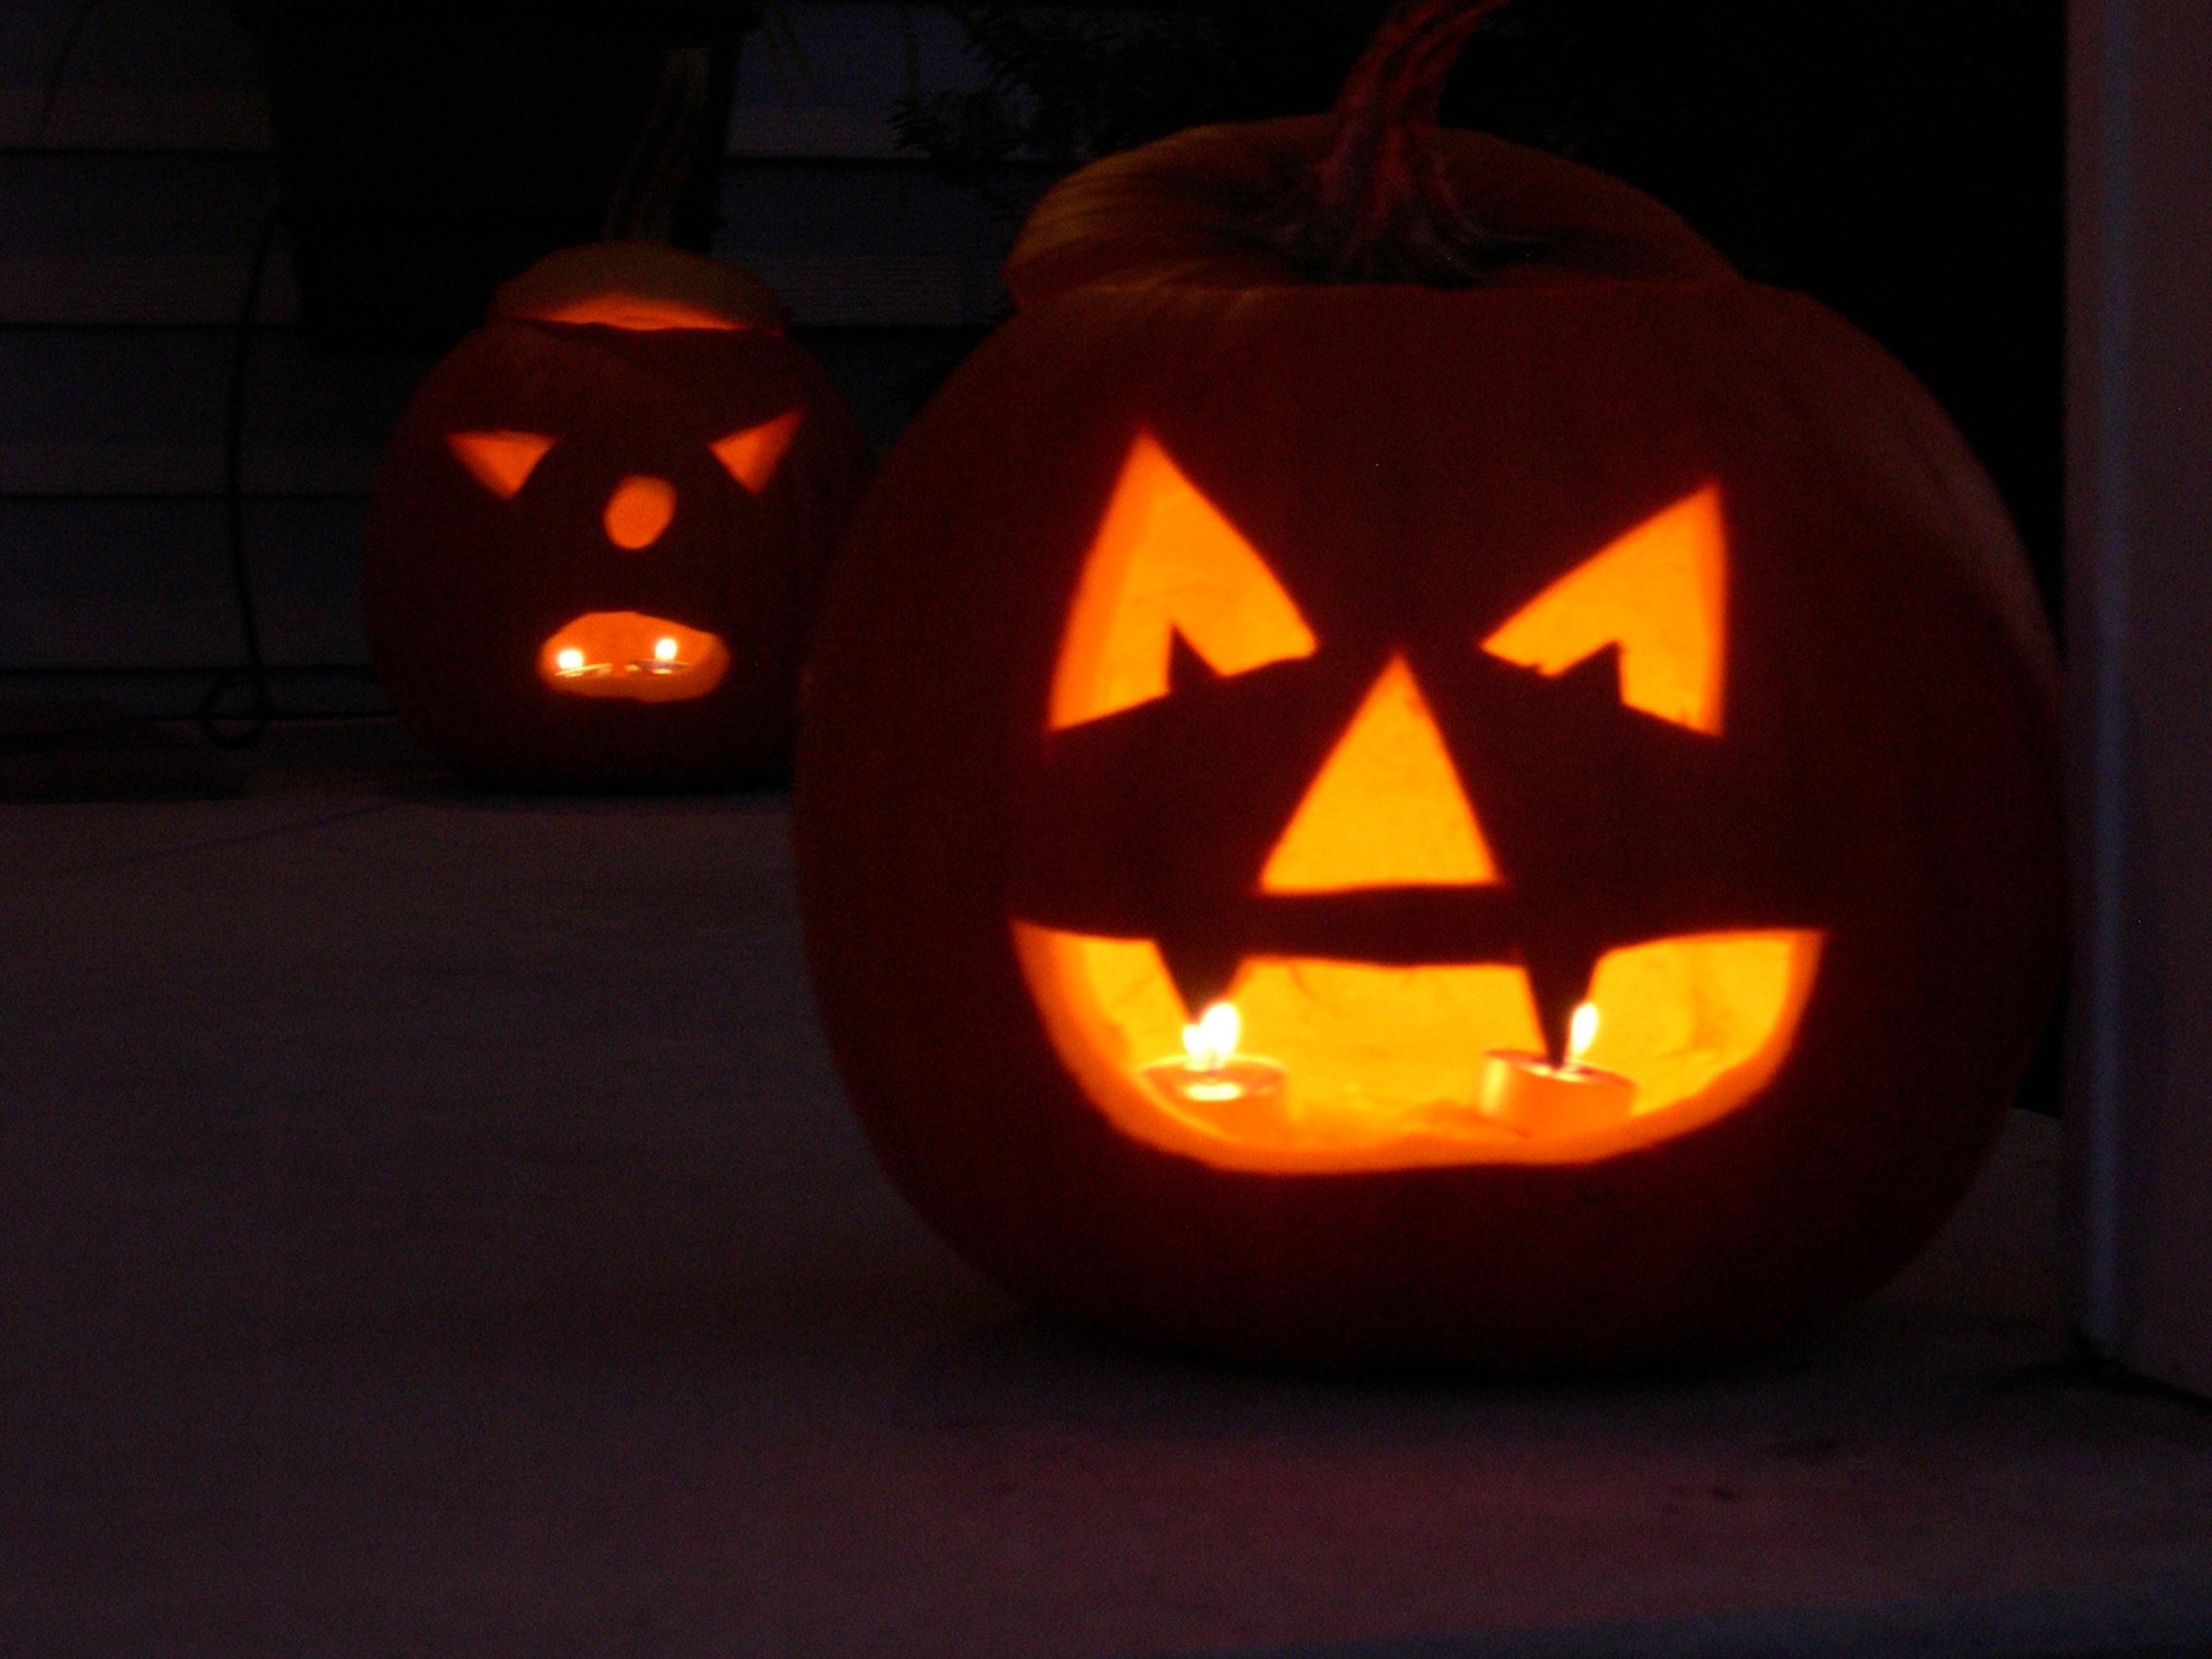 pumpkins lit up on the porch